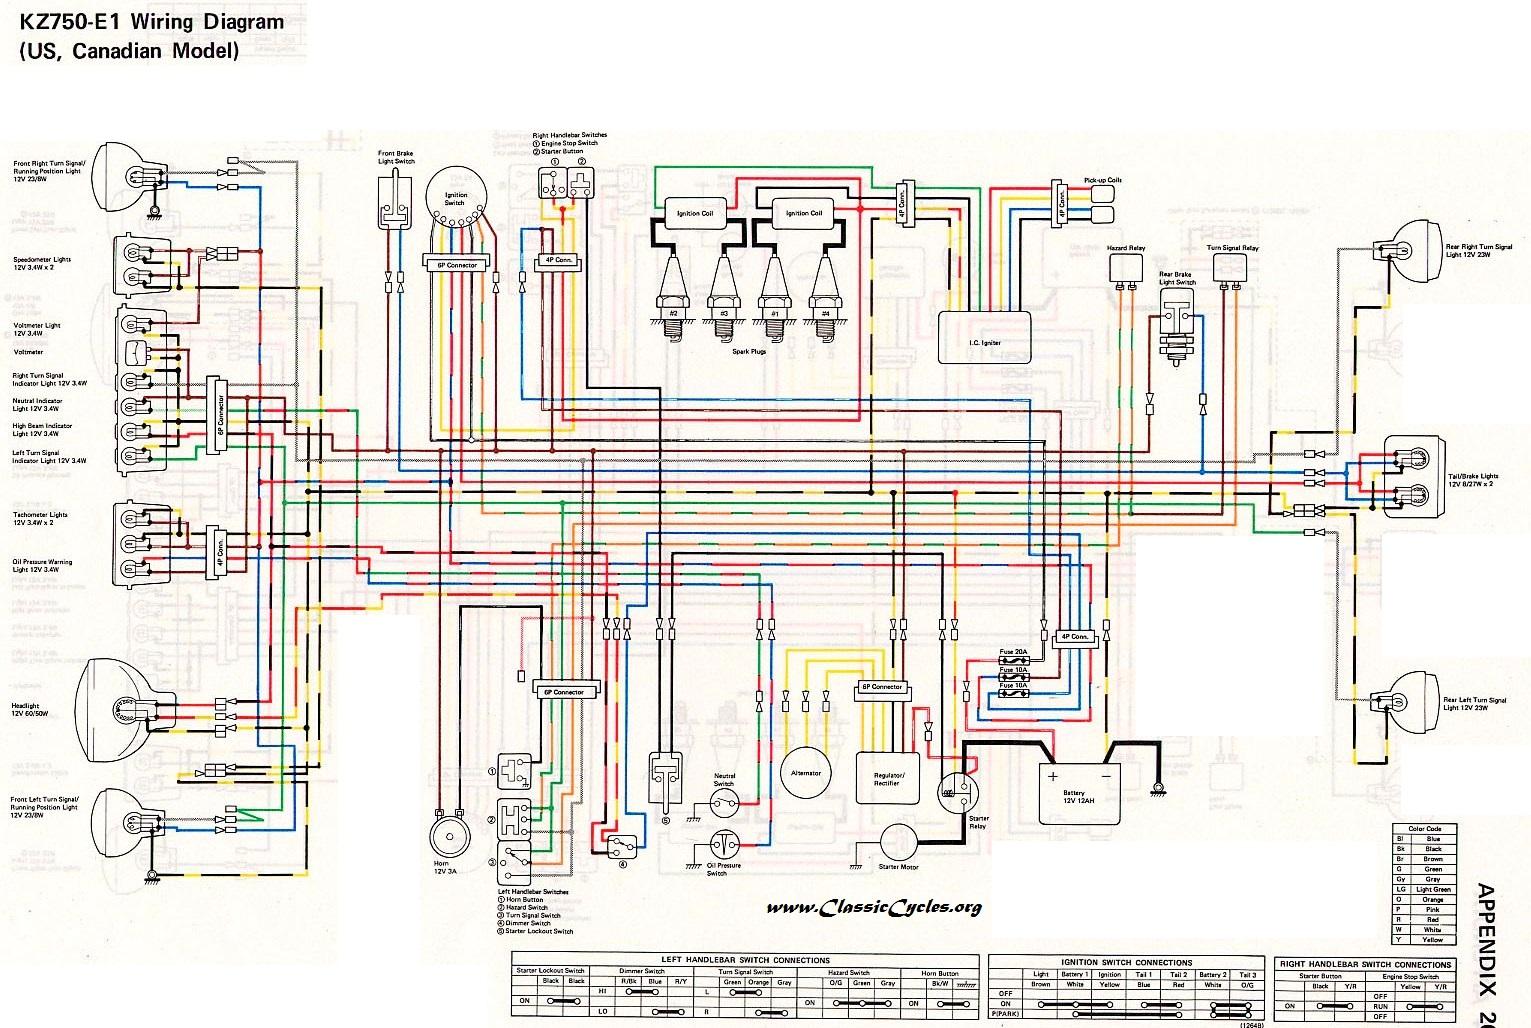 kawasaki 750 wiring diagram - wiring diagram overview circuit-soup -  circuit-soup.aigaravenna.it  aigaravenna.it